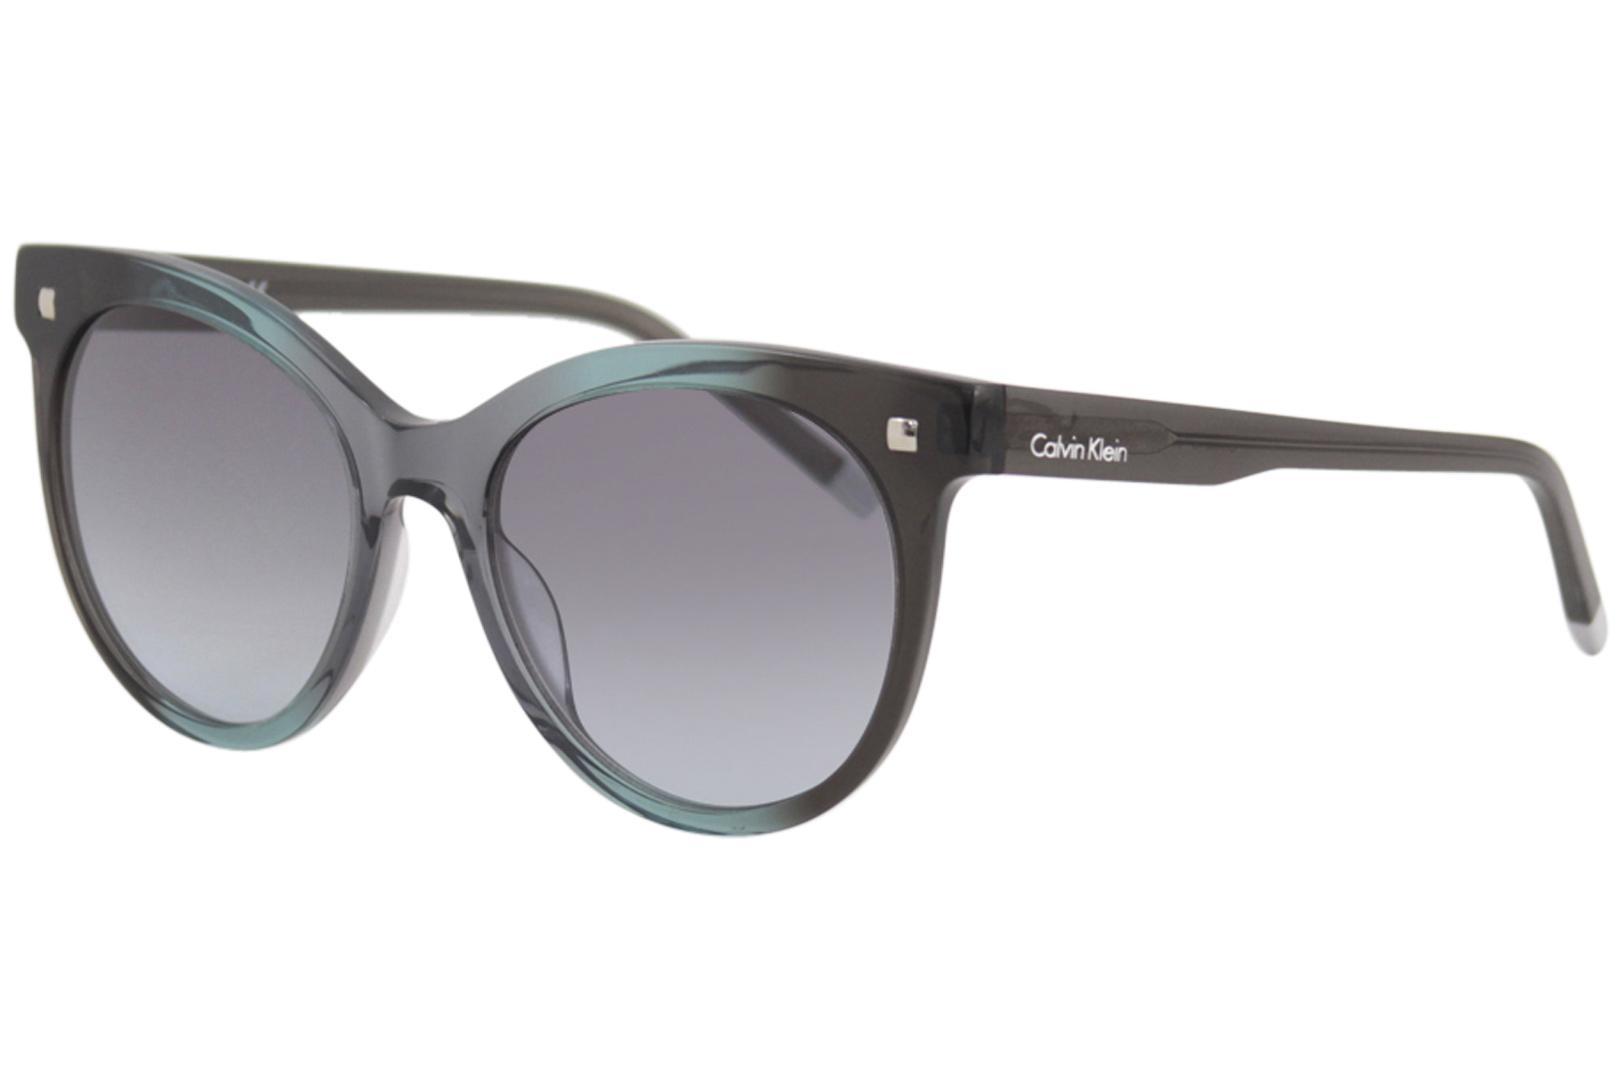 98dcd1645e Calvin Klein Women s CK4324S CK 4324 S Fashion Cateye Sunglasses